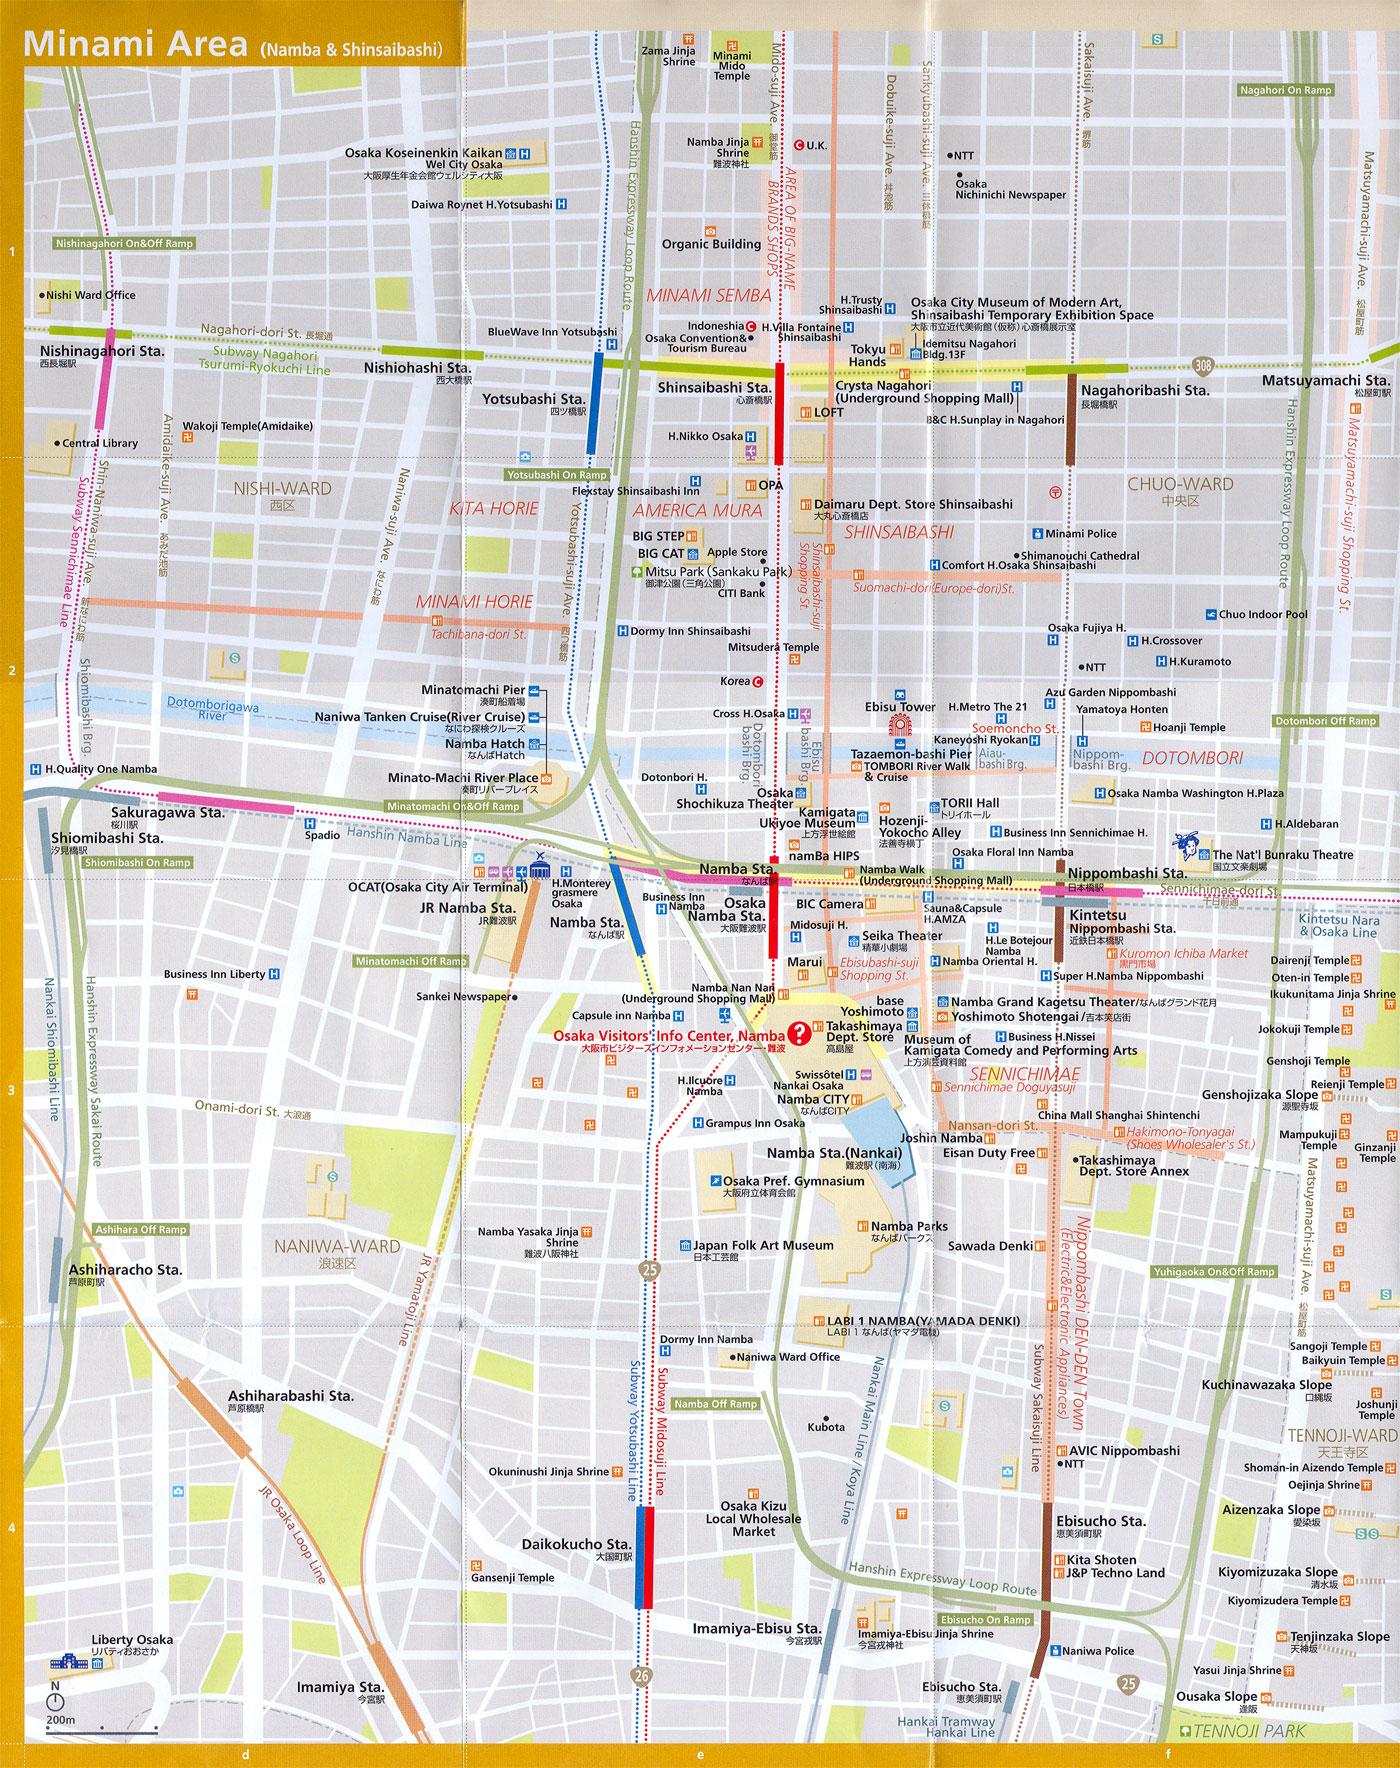 Subway Map 2009.Asisbiz 0 Minami Area Railway And Subway Map Brochure Nov 2009